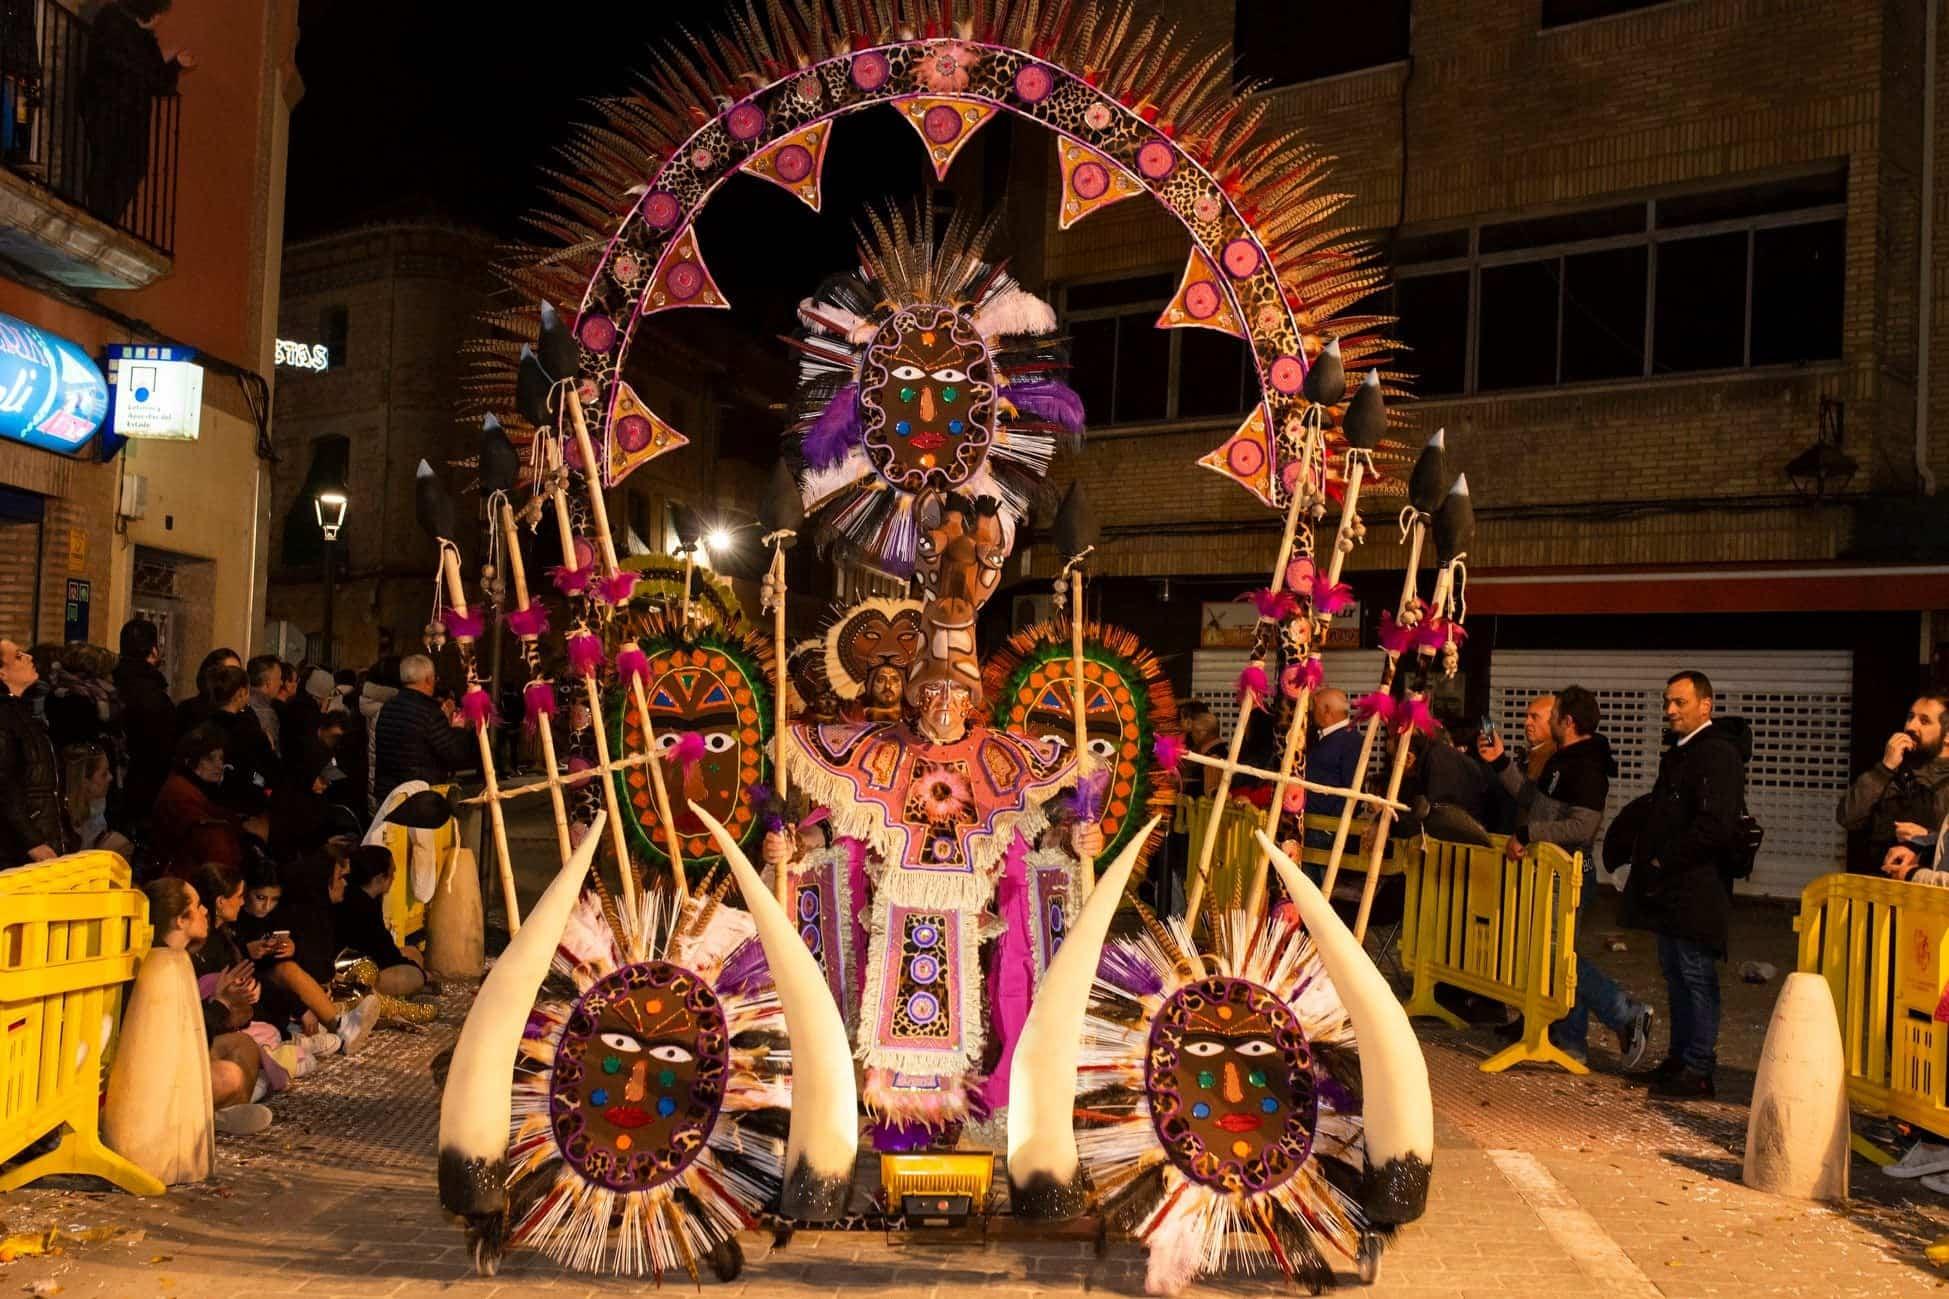 Carnaval de herencia 2020 ofertorio 142 - Selección de fotografías del Ofertorio del Carnaval de Herencia